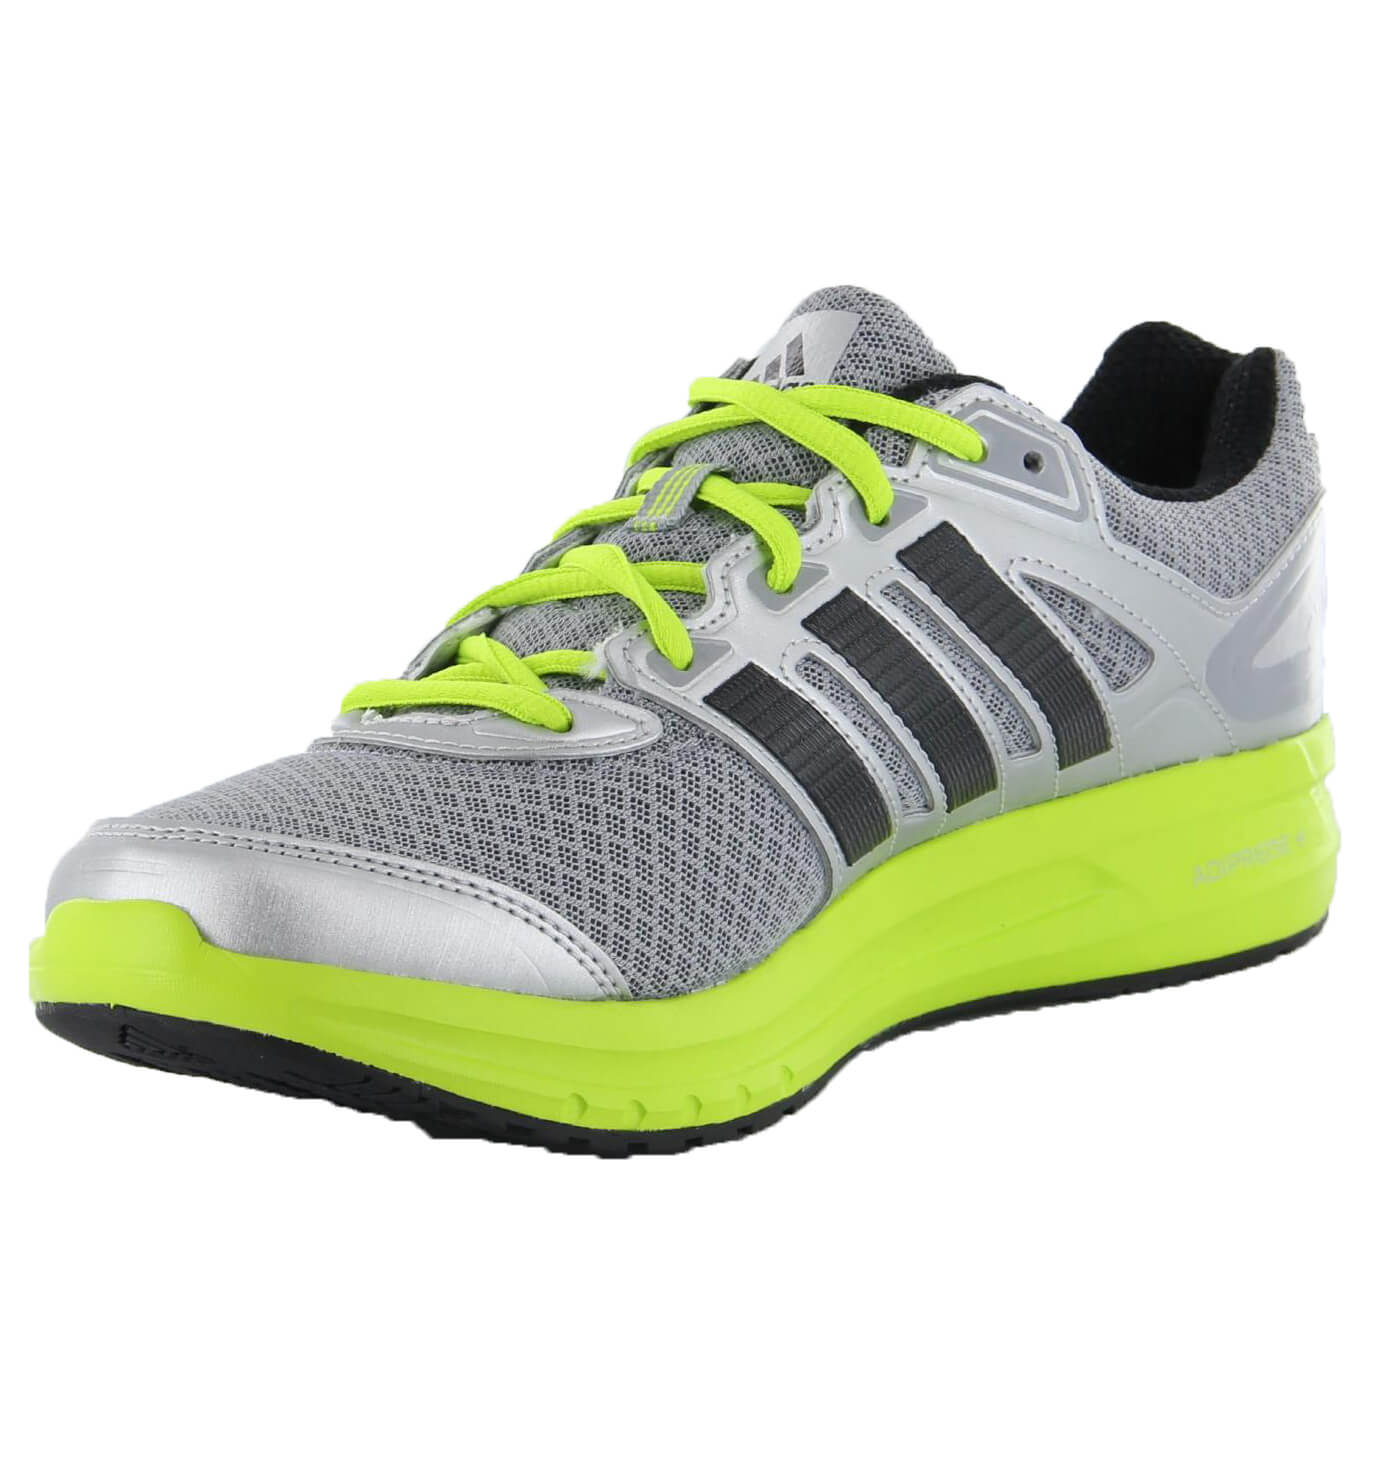 Uomo Adidas Running Cross Training Formato Athletic 10.5